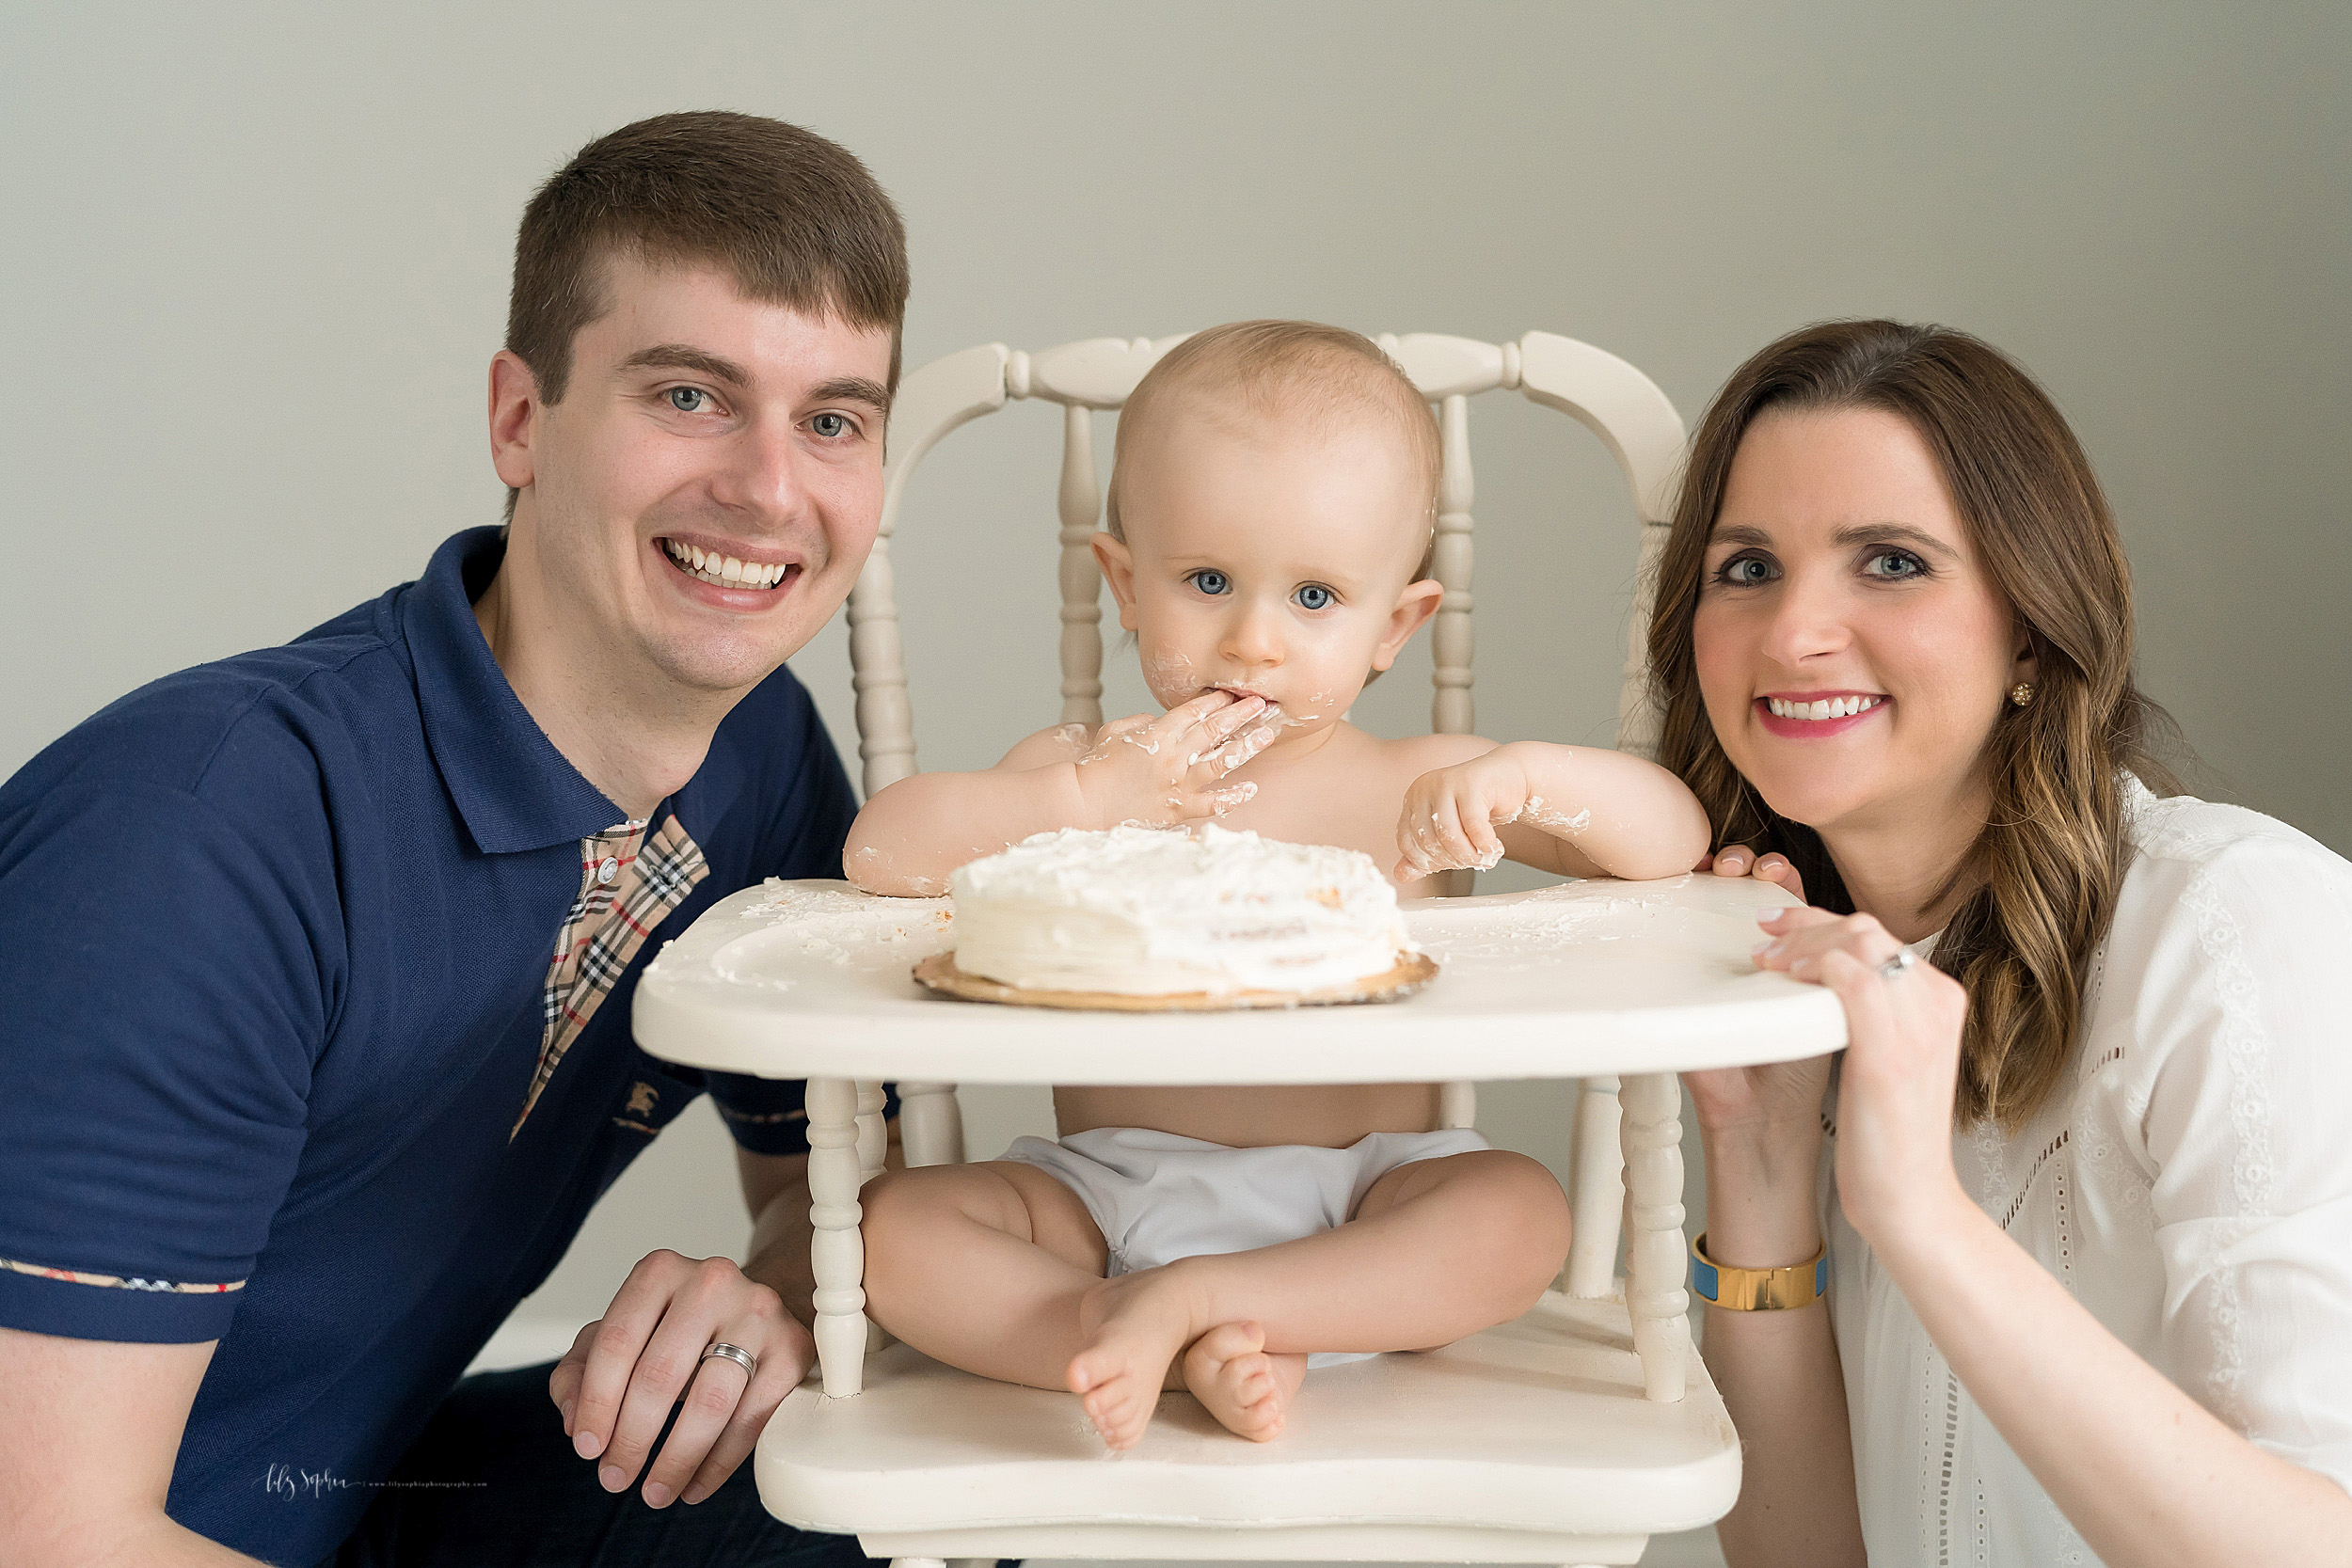 atlanta-brookhaven-alpharetta-sandy-springs-buckhead-virginia-highlands-west-end-decatur-lily-sophia-photography-studio-first-birthday-cake-smash-toddler-baby-boy-family-photos_1148.jpg